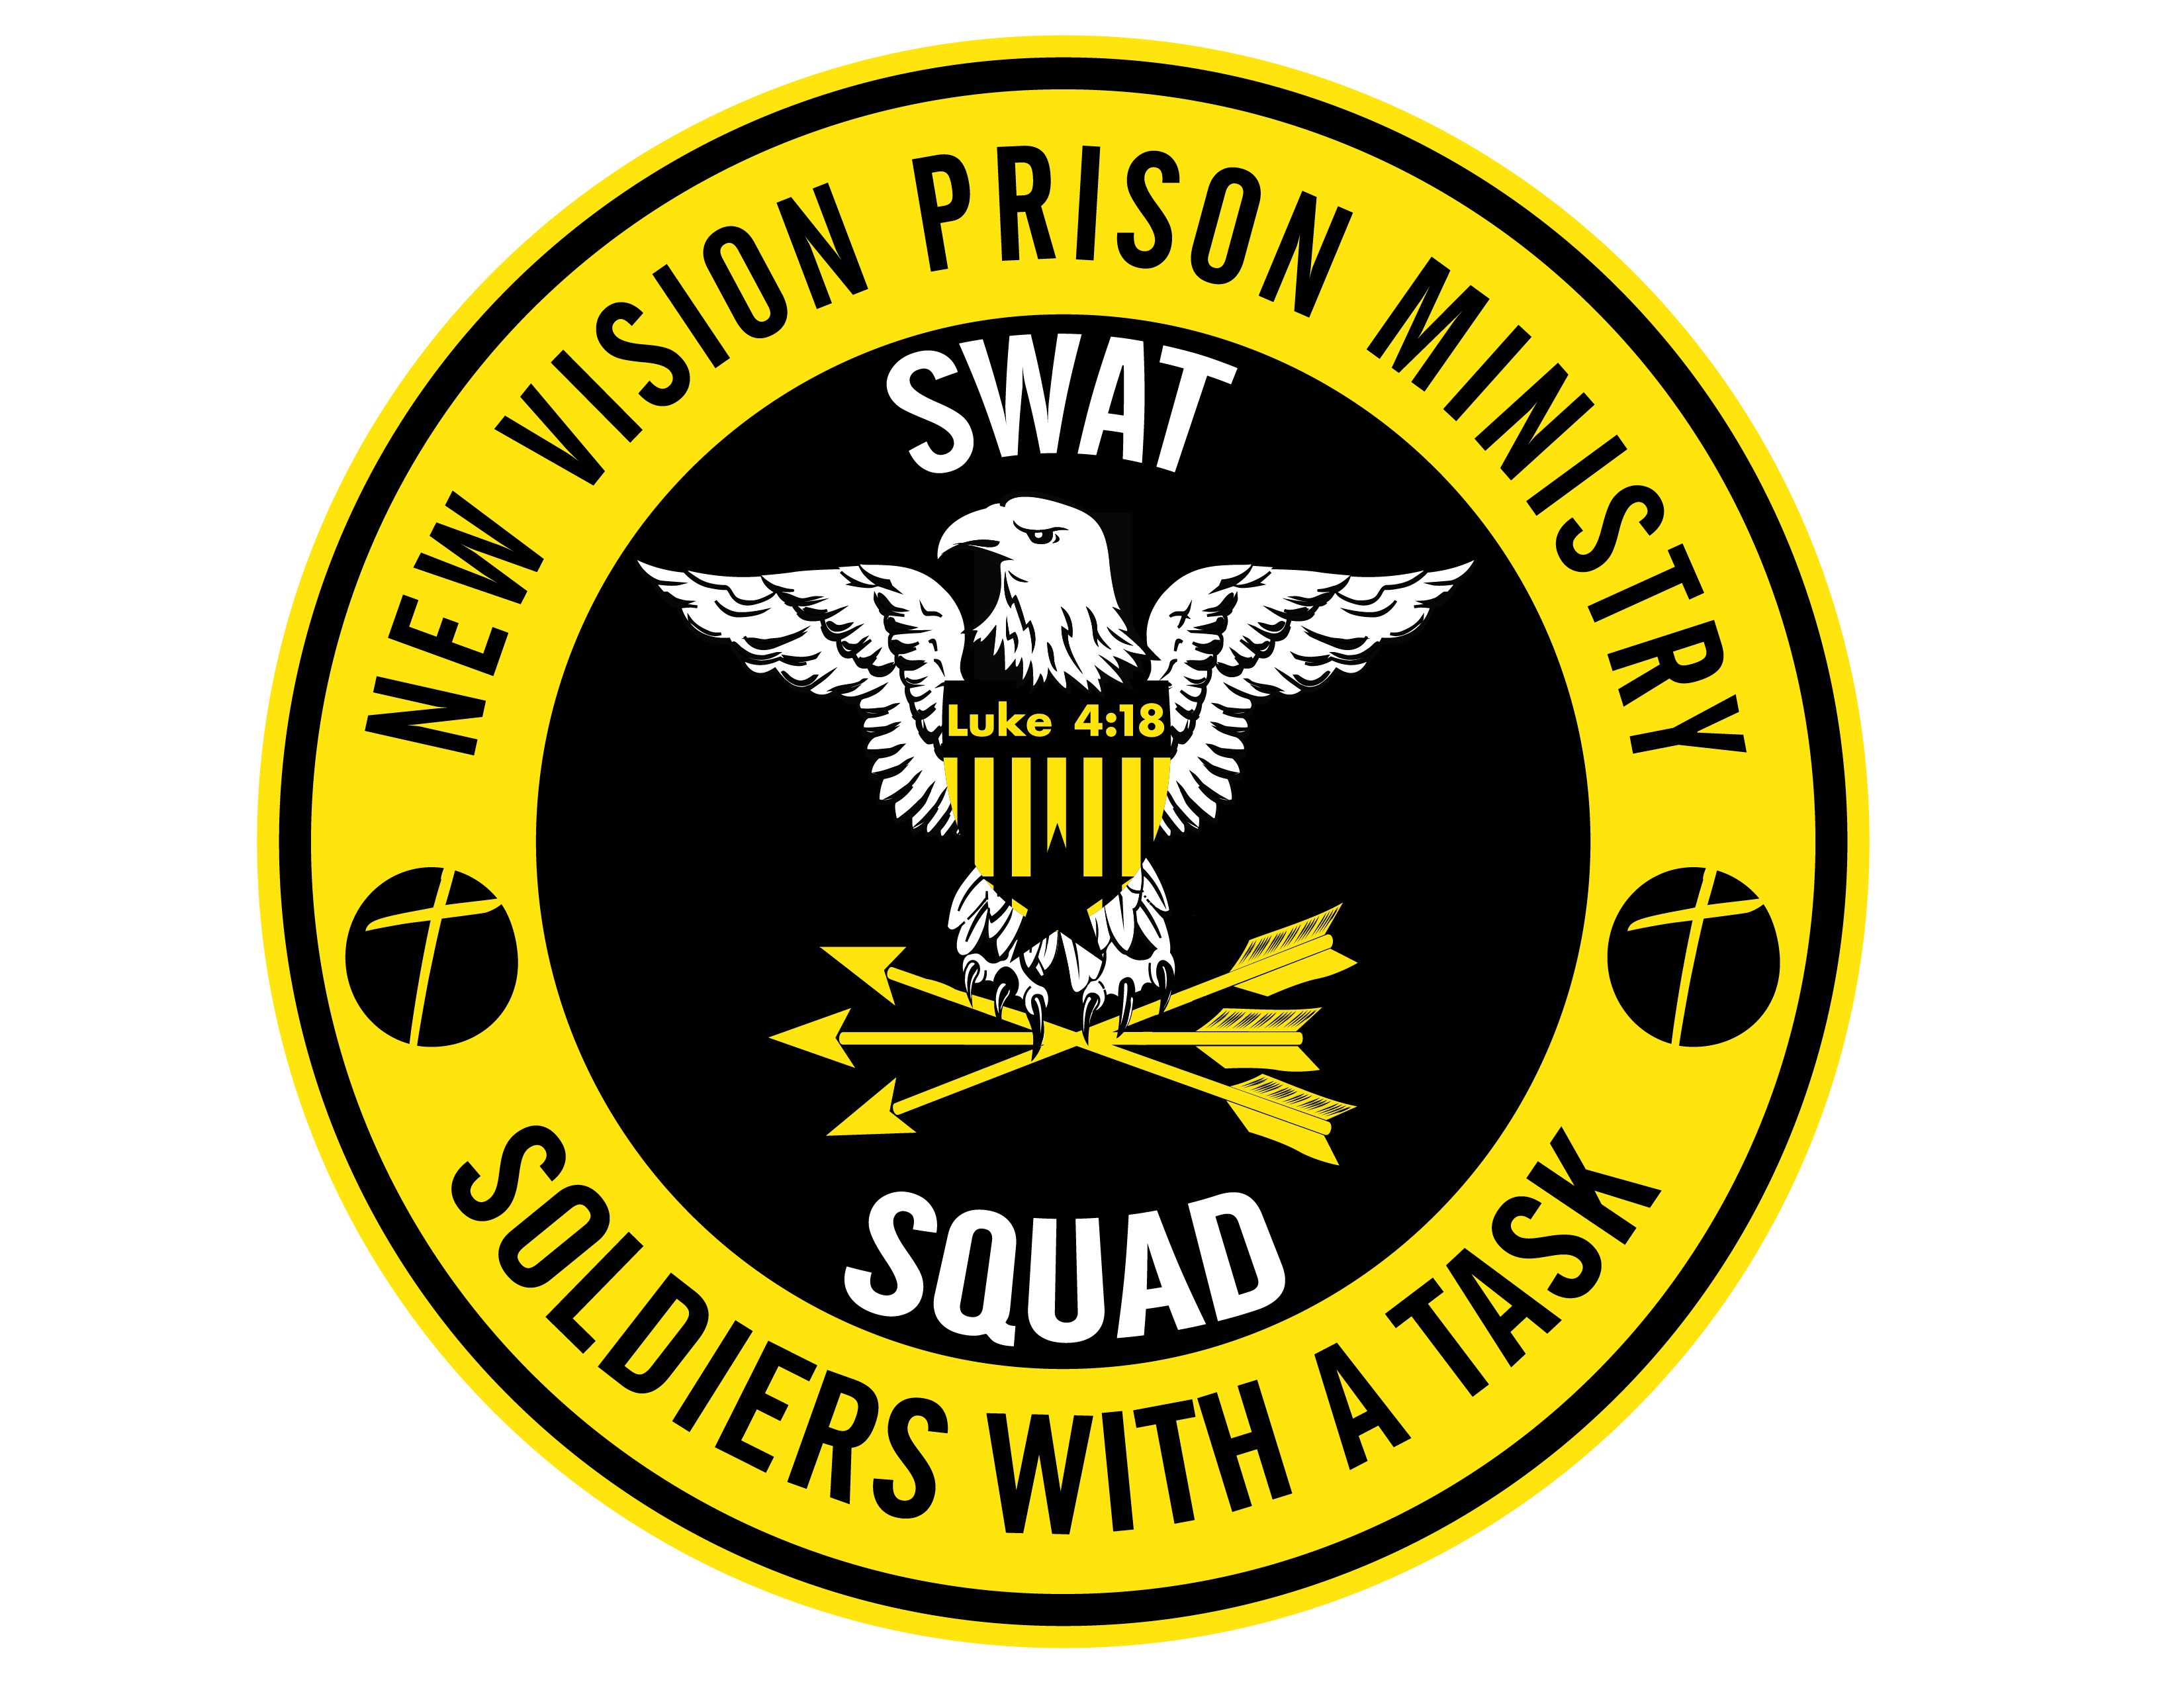 Swat logo updated